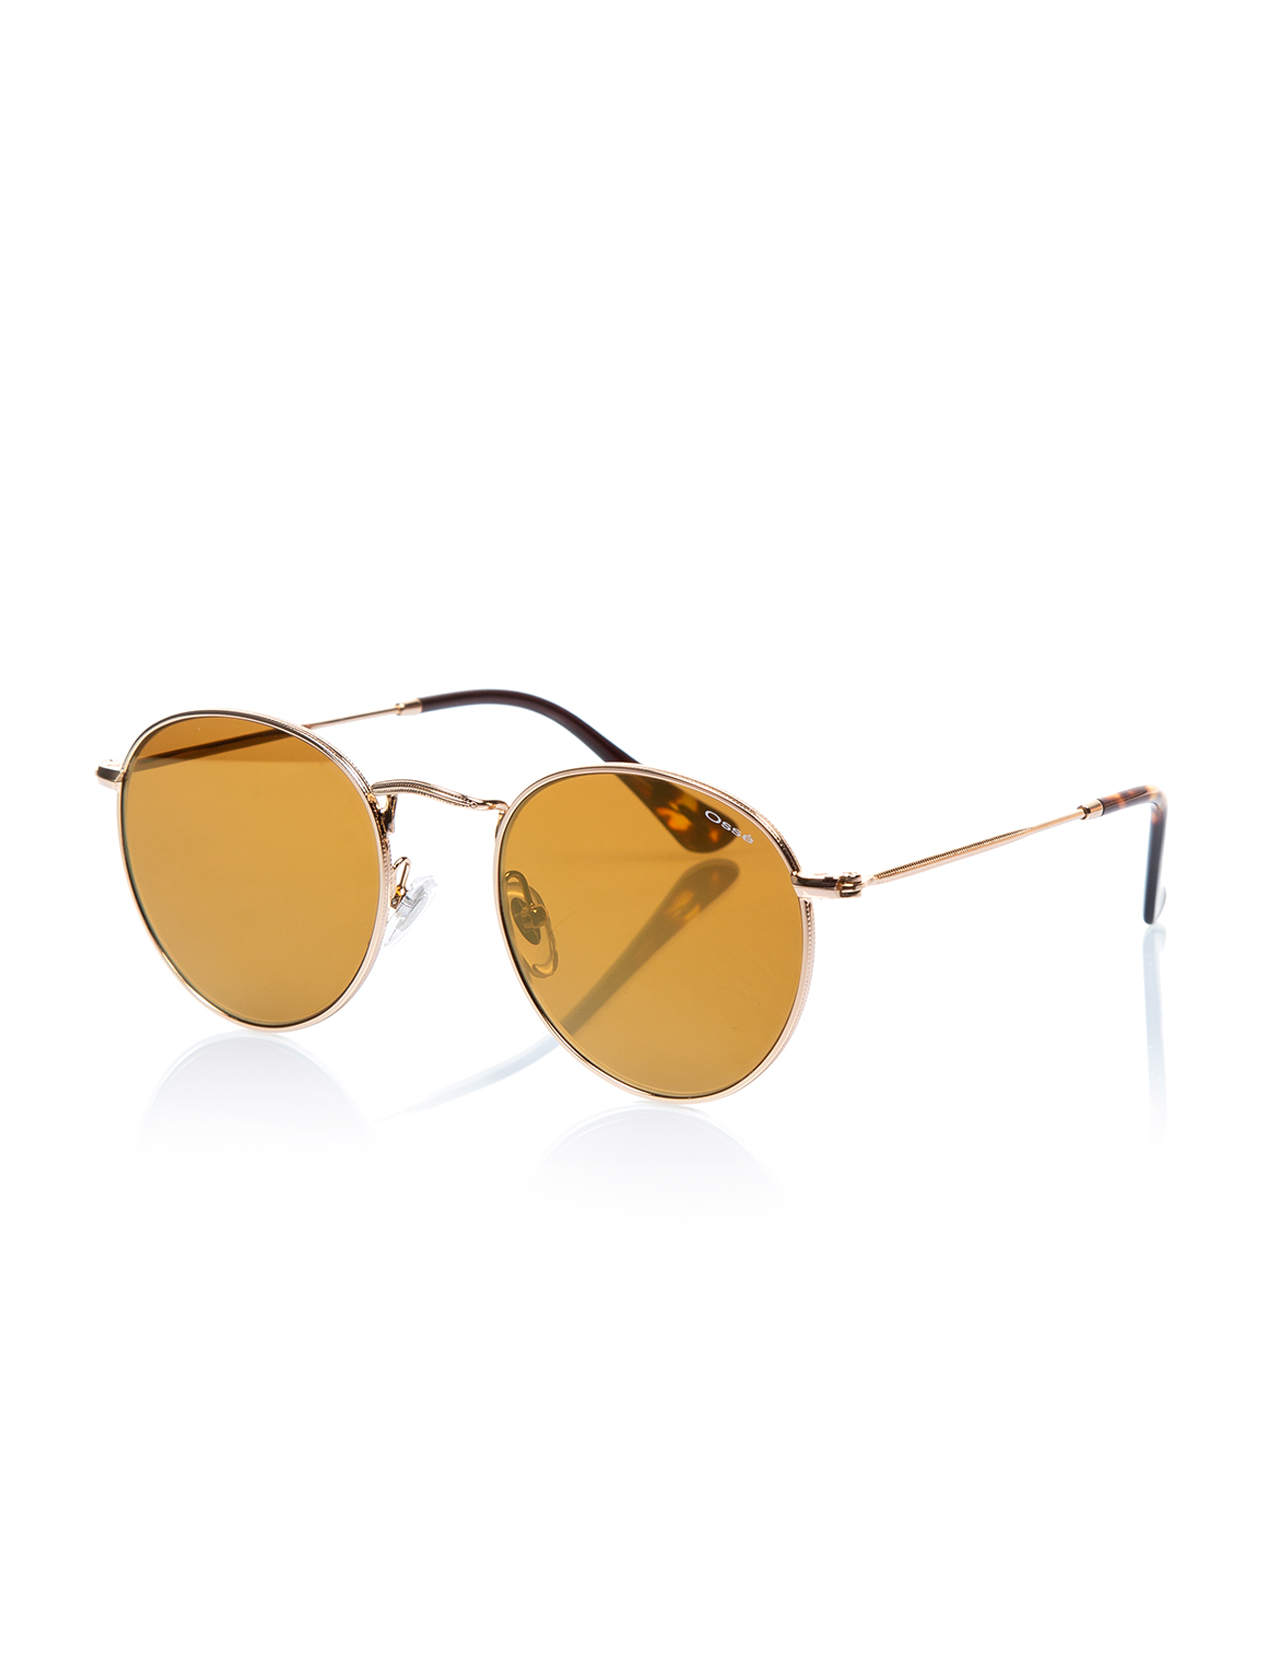 Unisex sunglasses os 2485 04 metal gold crystal round round 50-22-145 osse